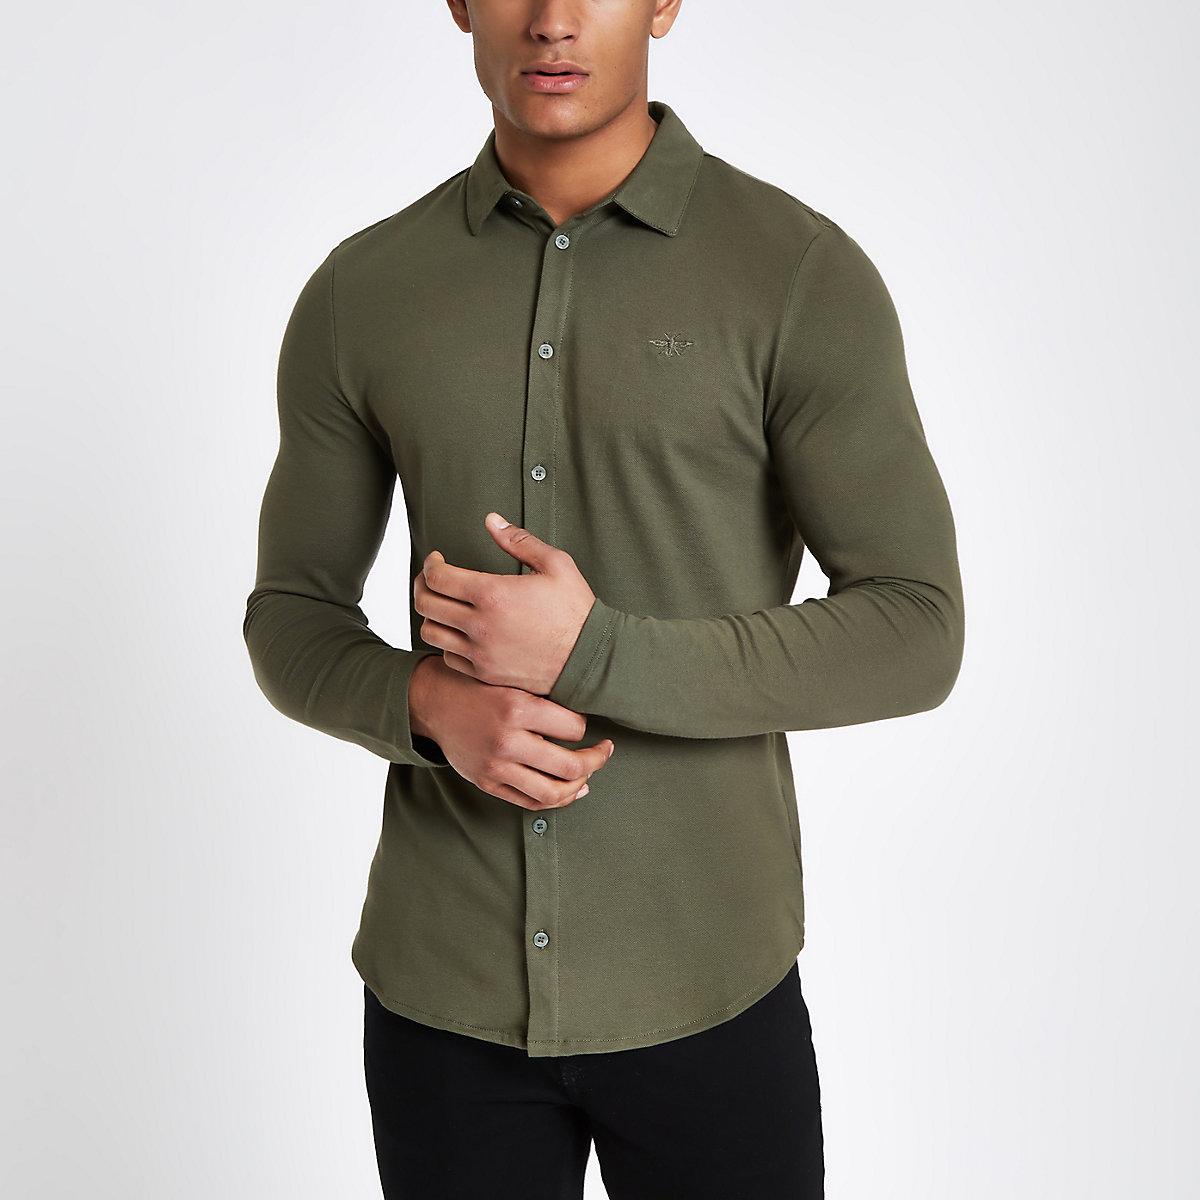 Khaki muscle fit button-down shirt